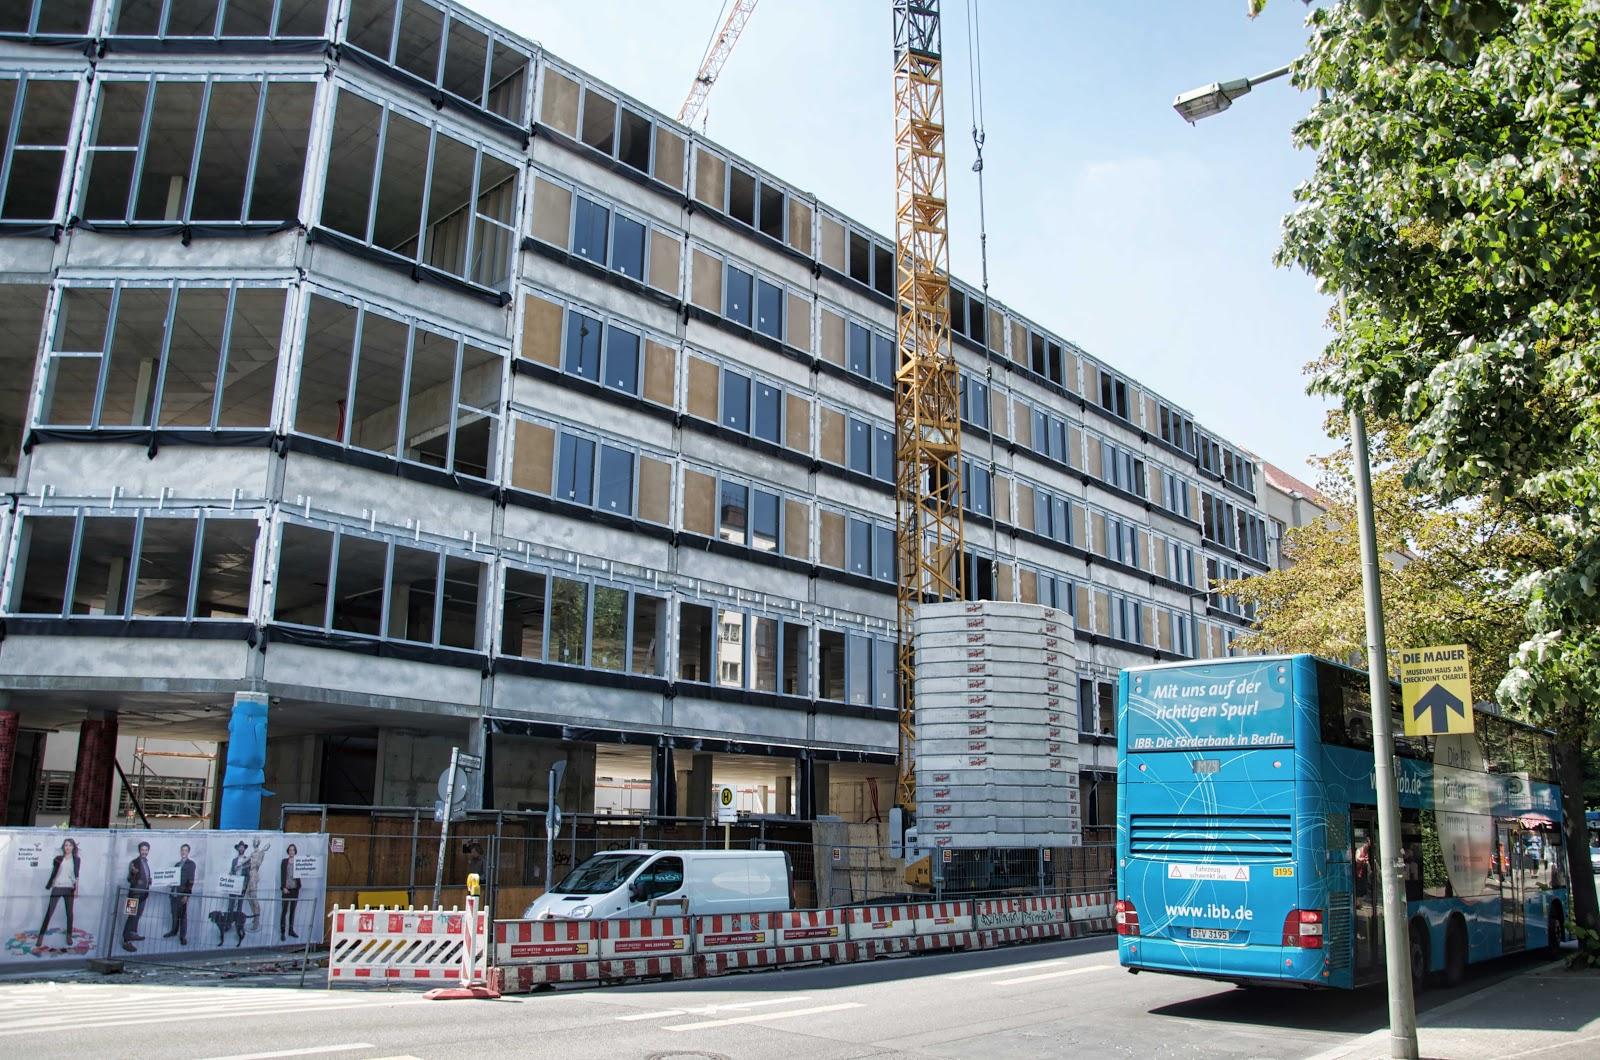 berliner baustellen 0403 baustelle erweiterung aufbau haus planet modulor moritzplatz. Black Bedroom Furniture Sets. Home Design Ideas